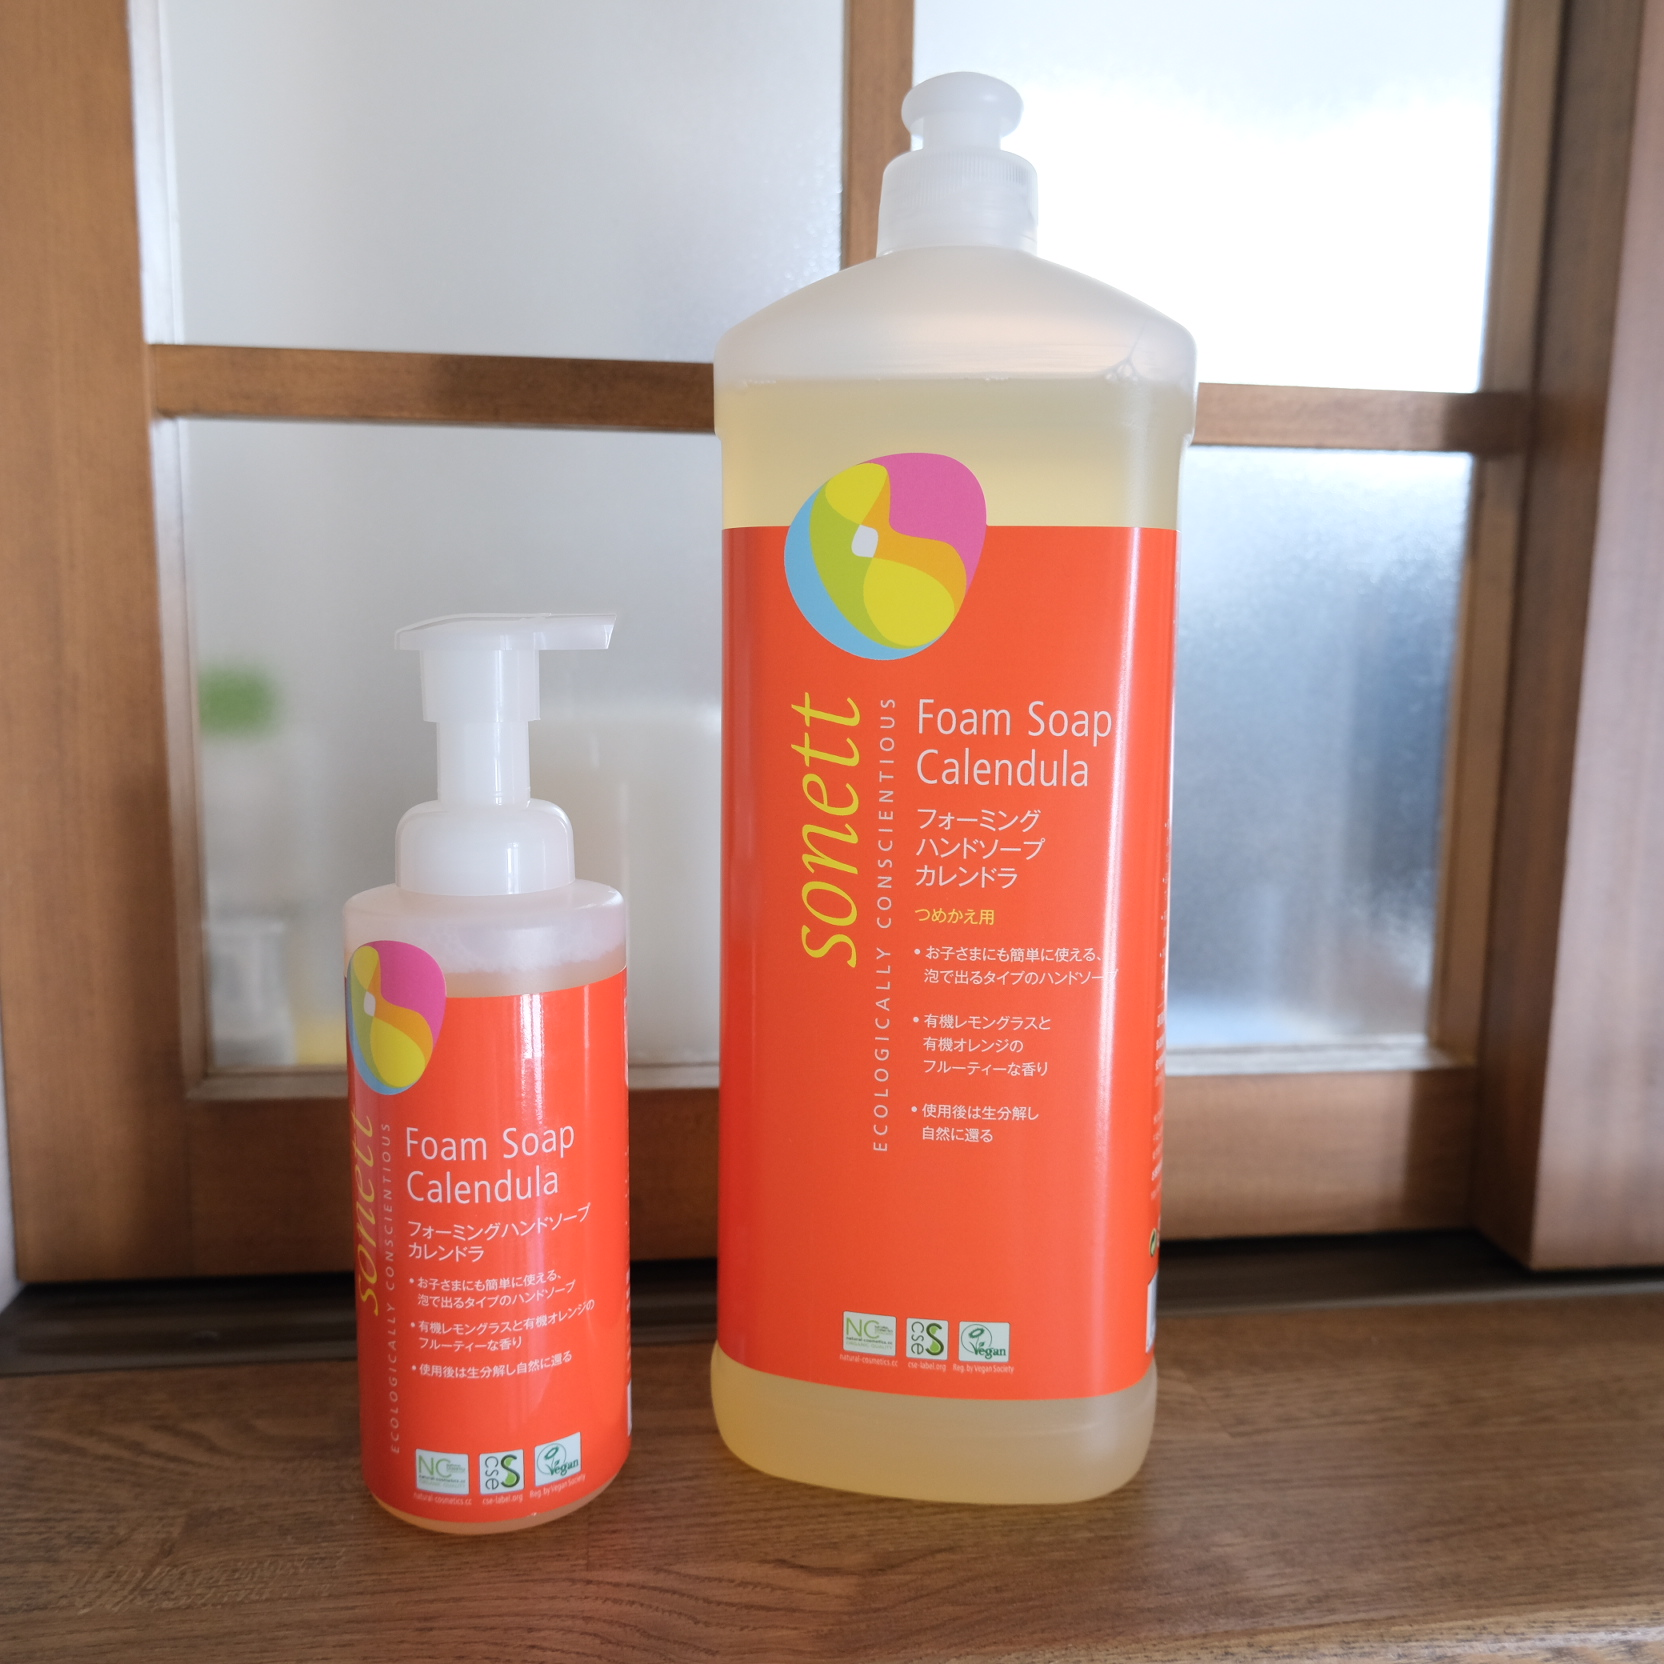 SONETT フォーミングハンドソープ カレンドラ さわやかな柑橘系の香り(手洗い用泡洗浄料)